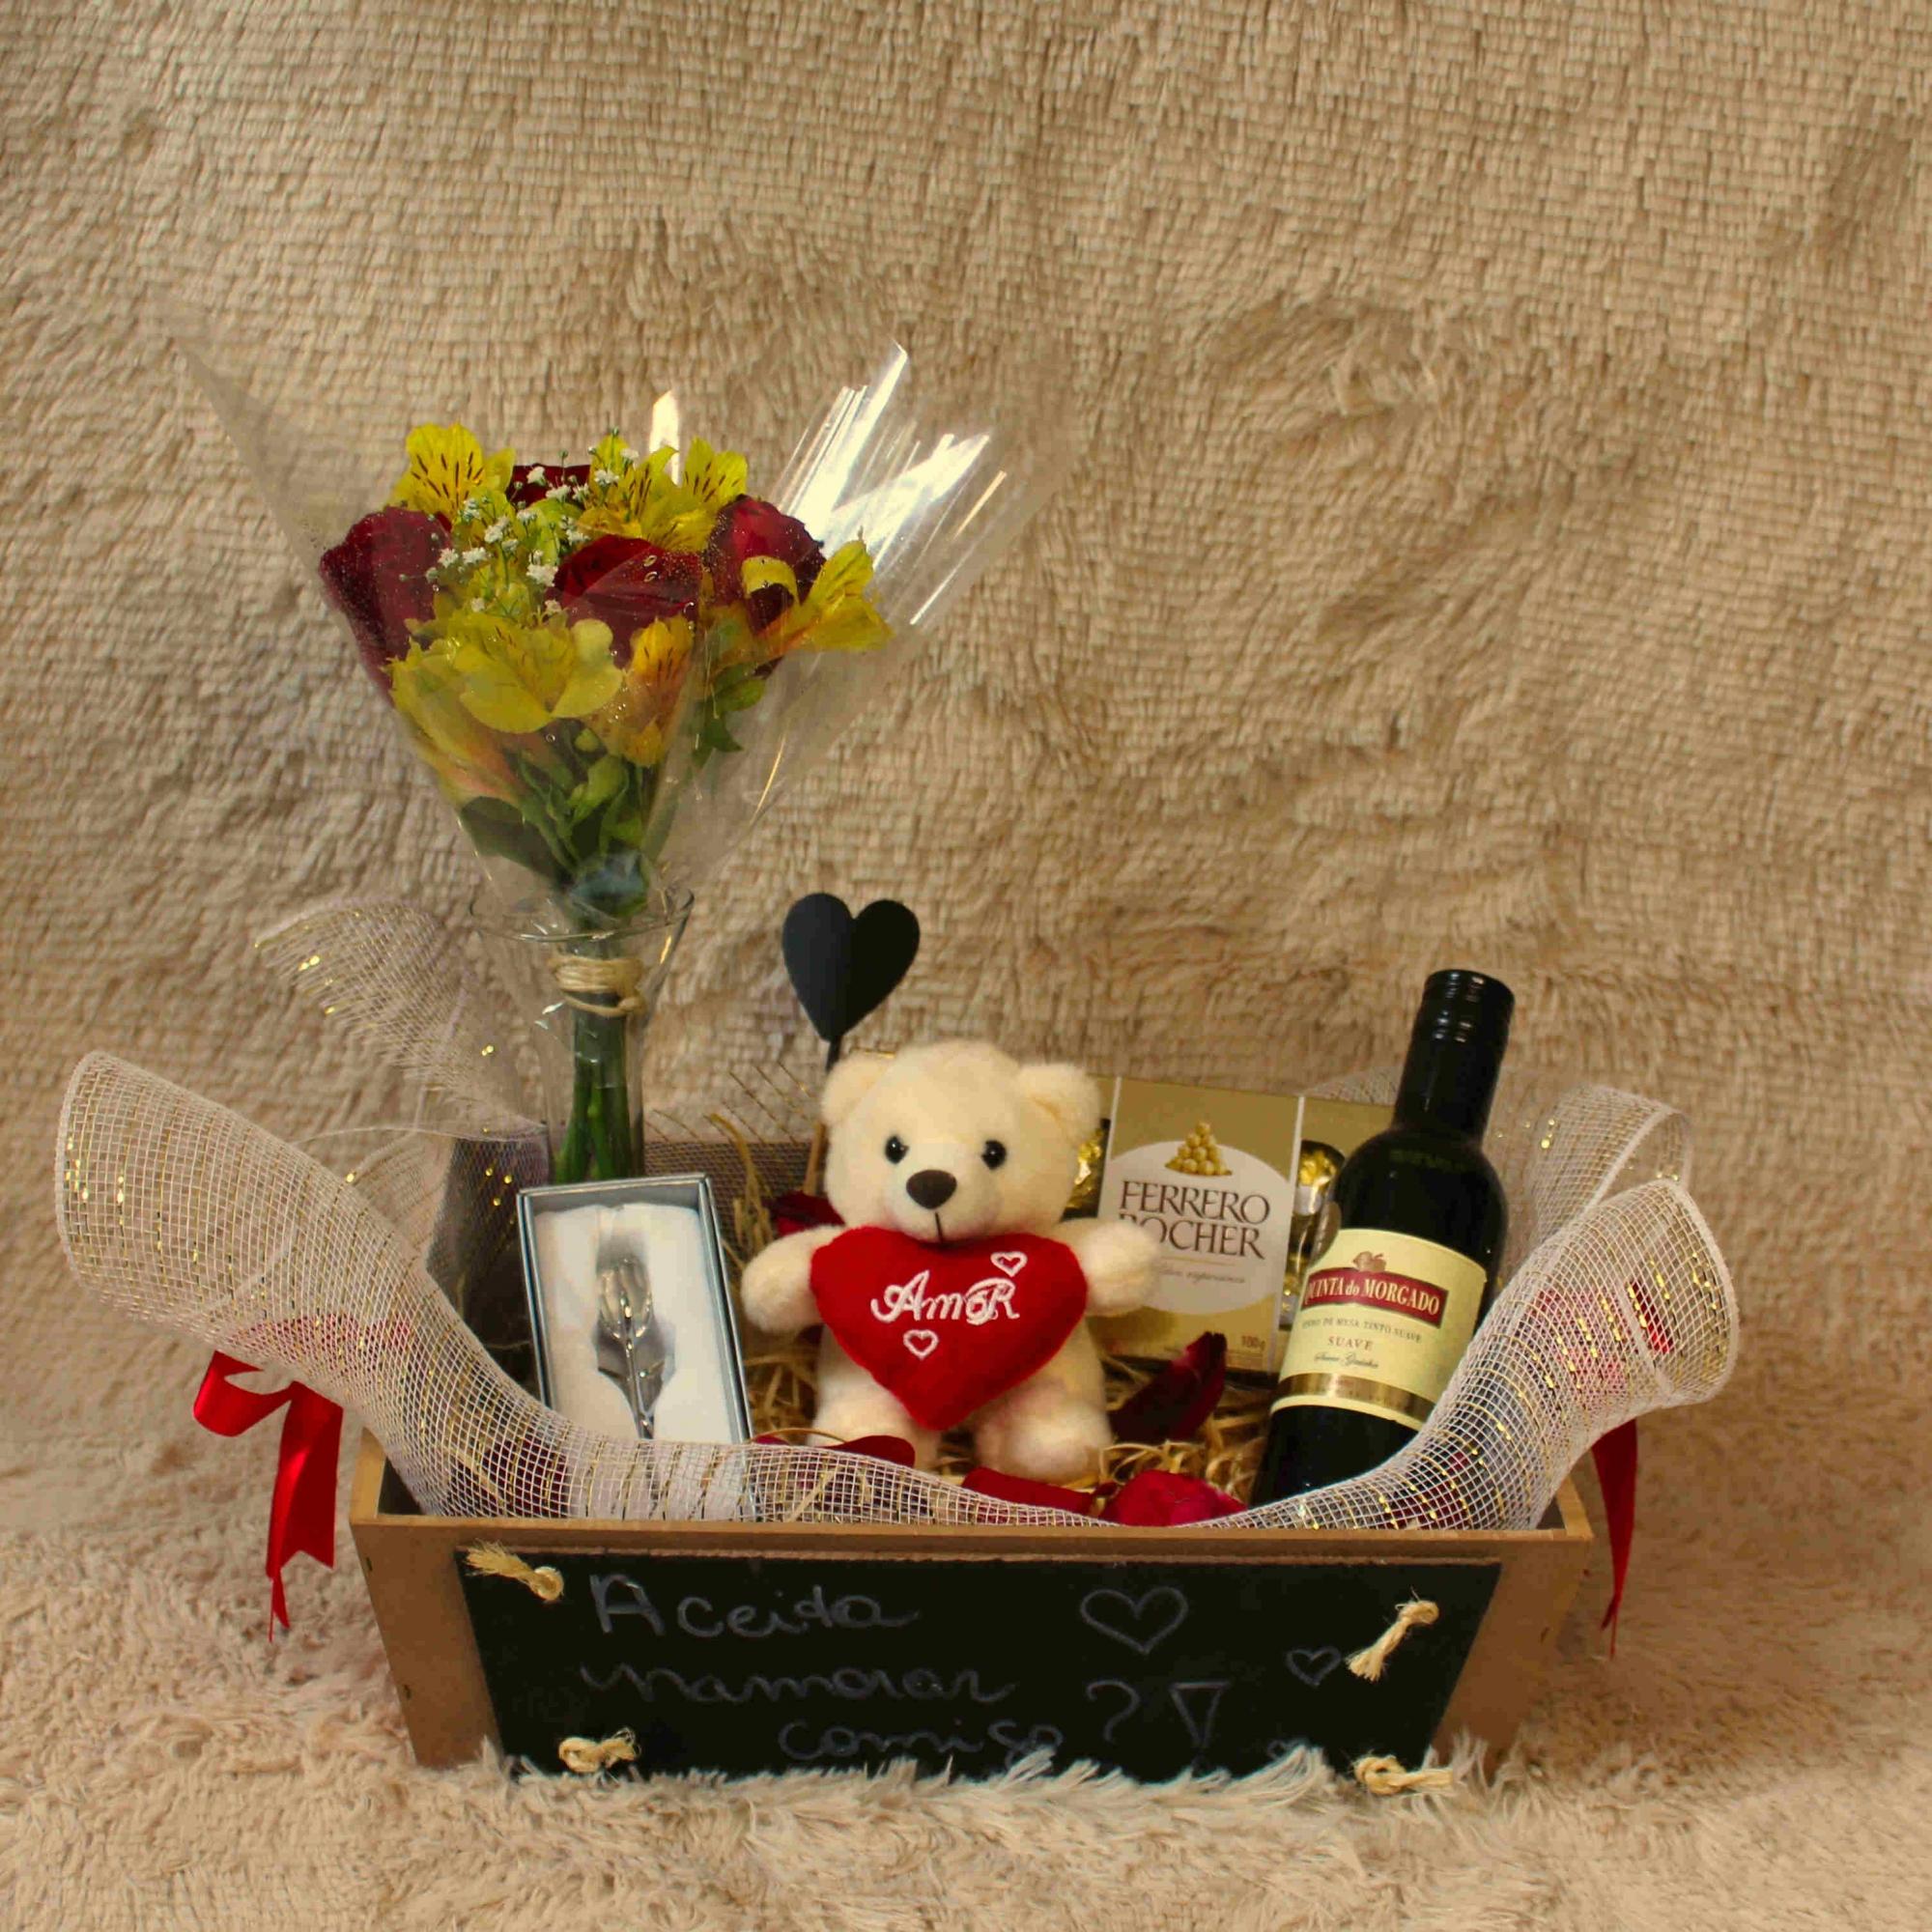 Bandeja Romântica de Lousa com arranjo Floral